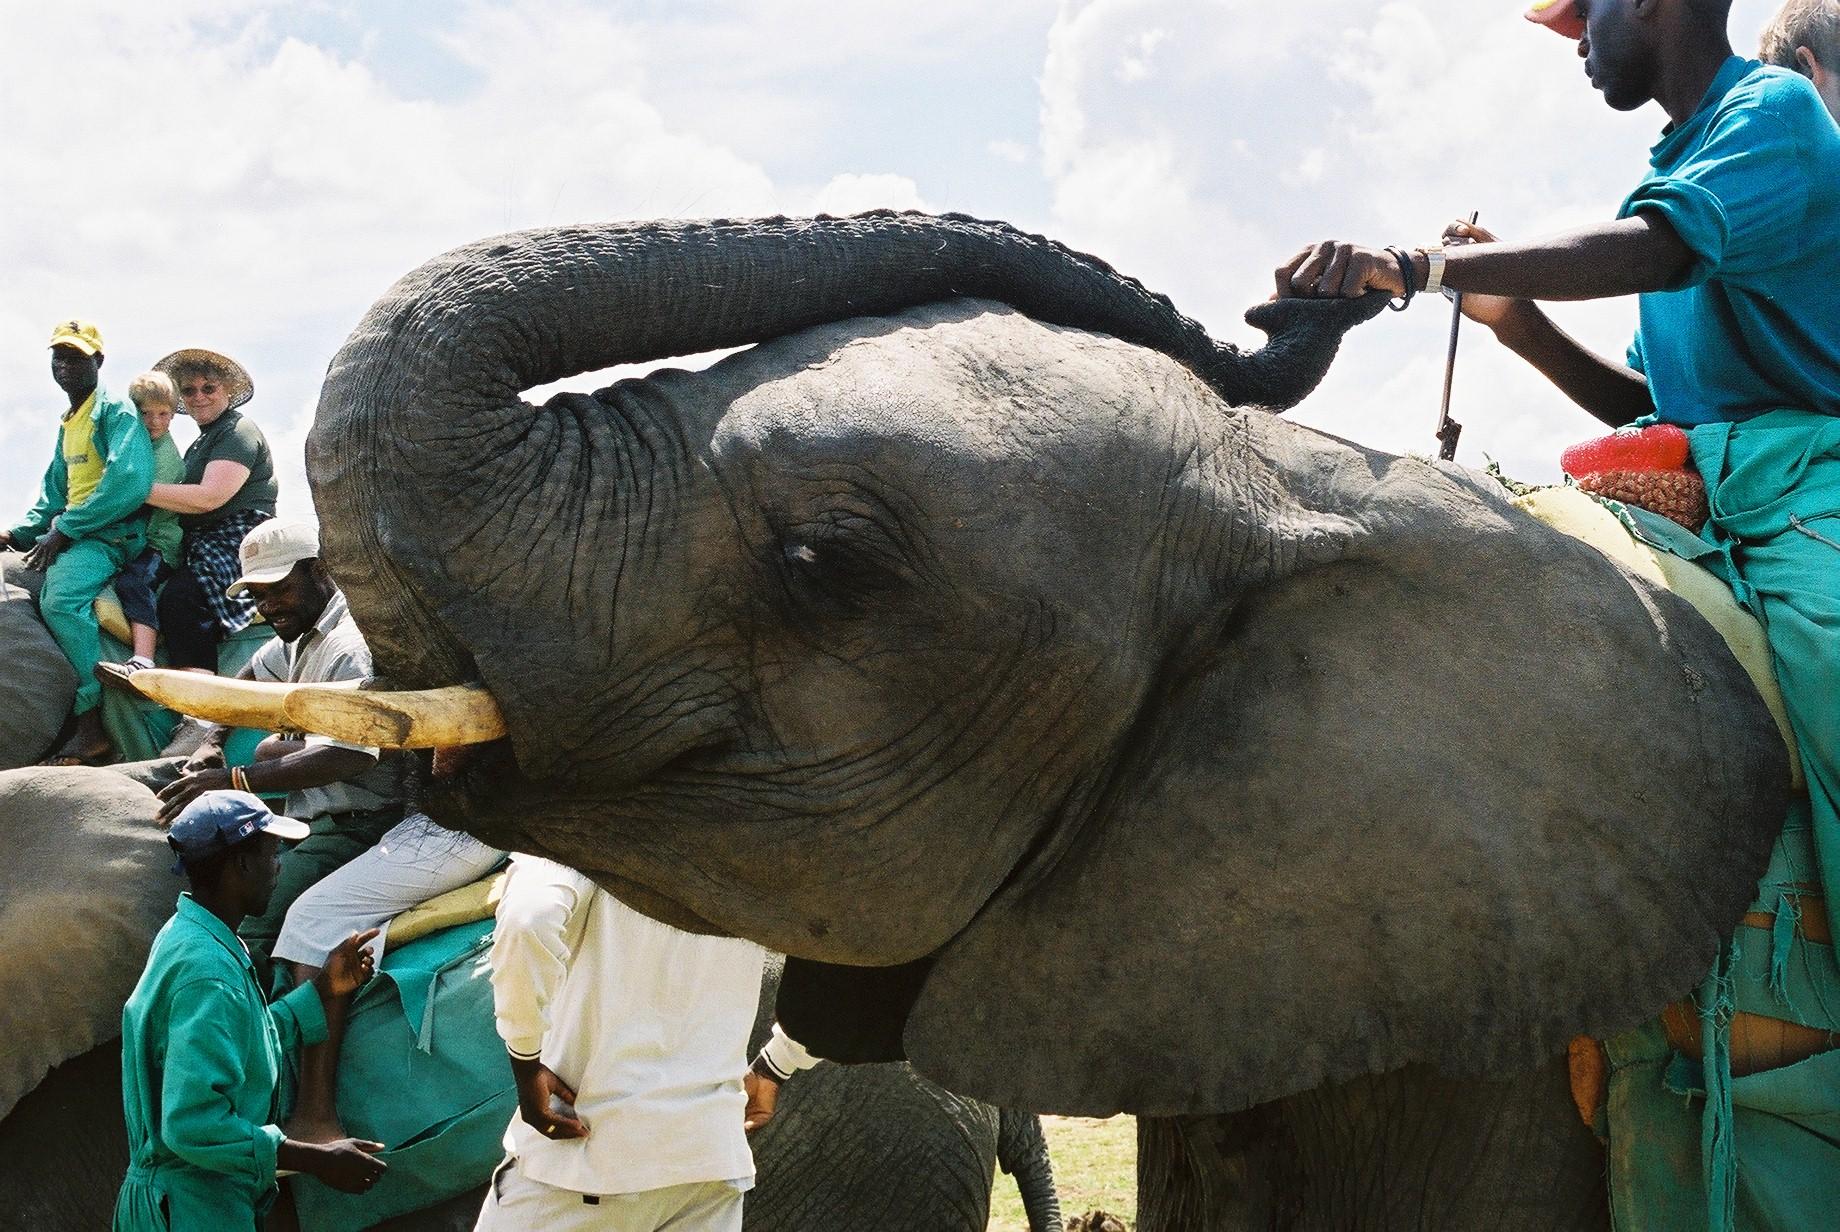 Tourists riding elephants